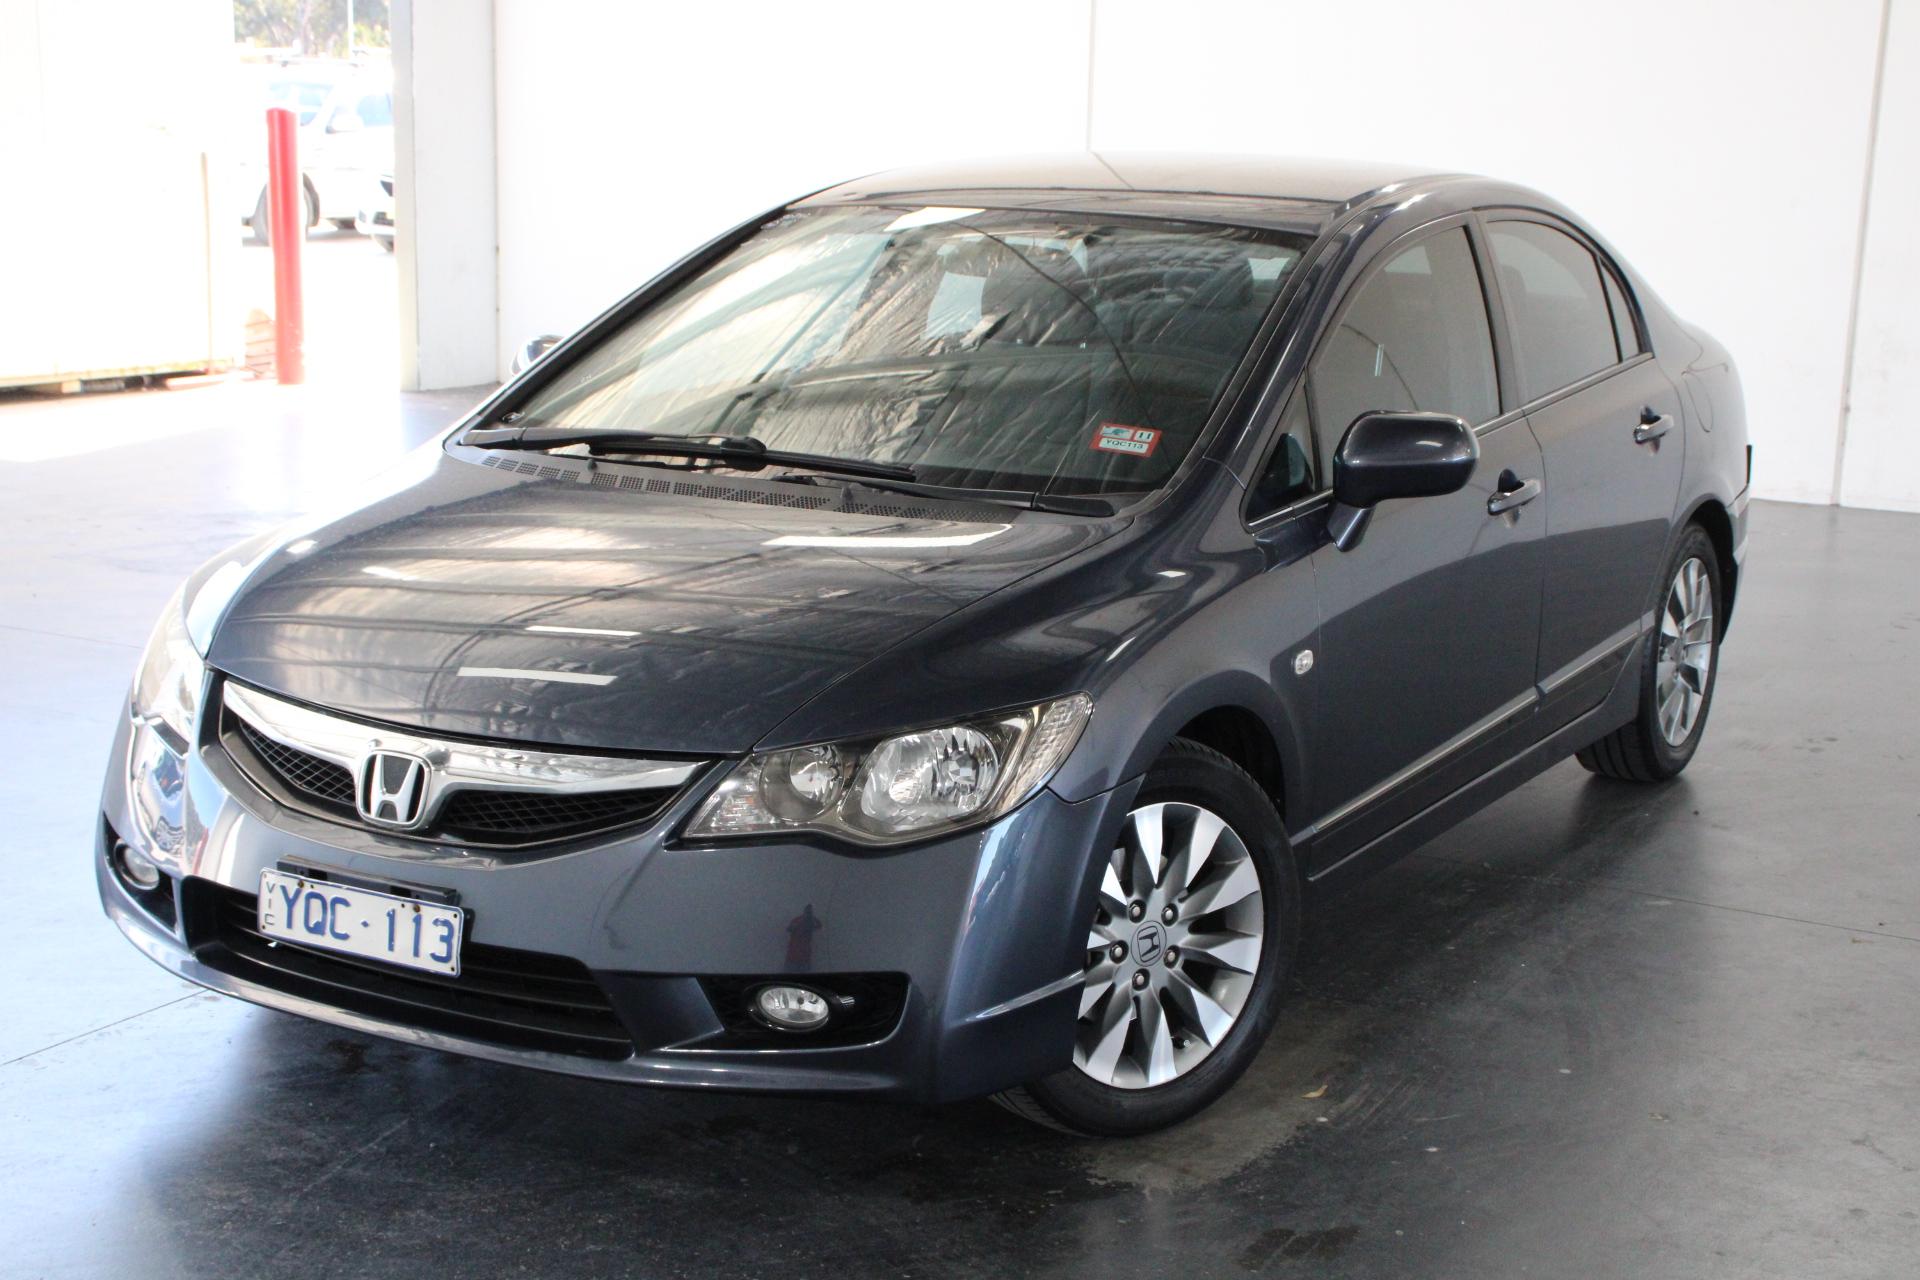 2011 Honda Civic VTi-L 8TH GEN Automatic Sedan